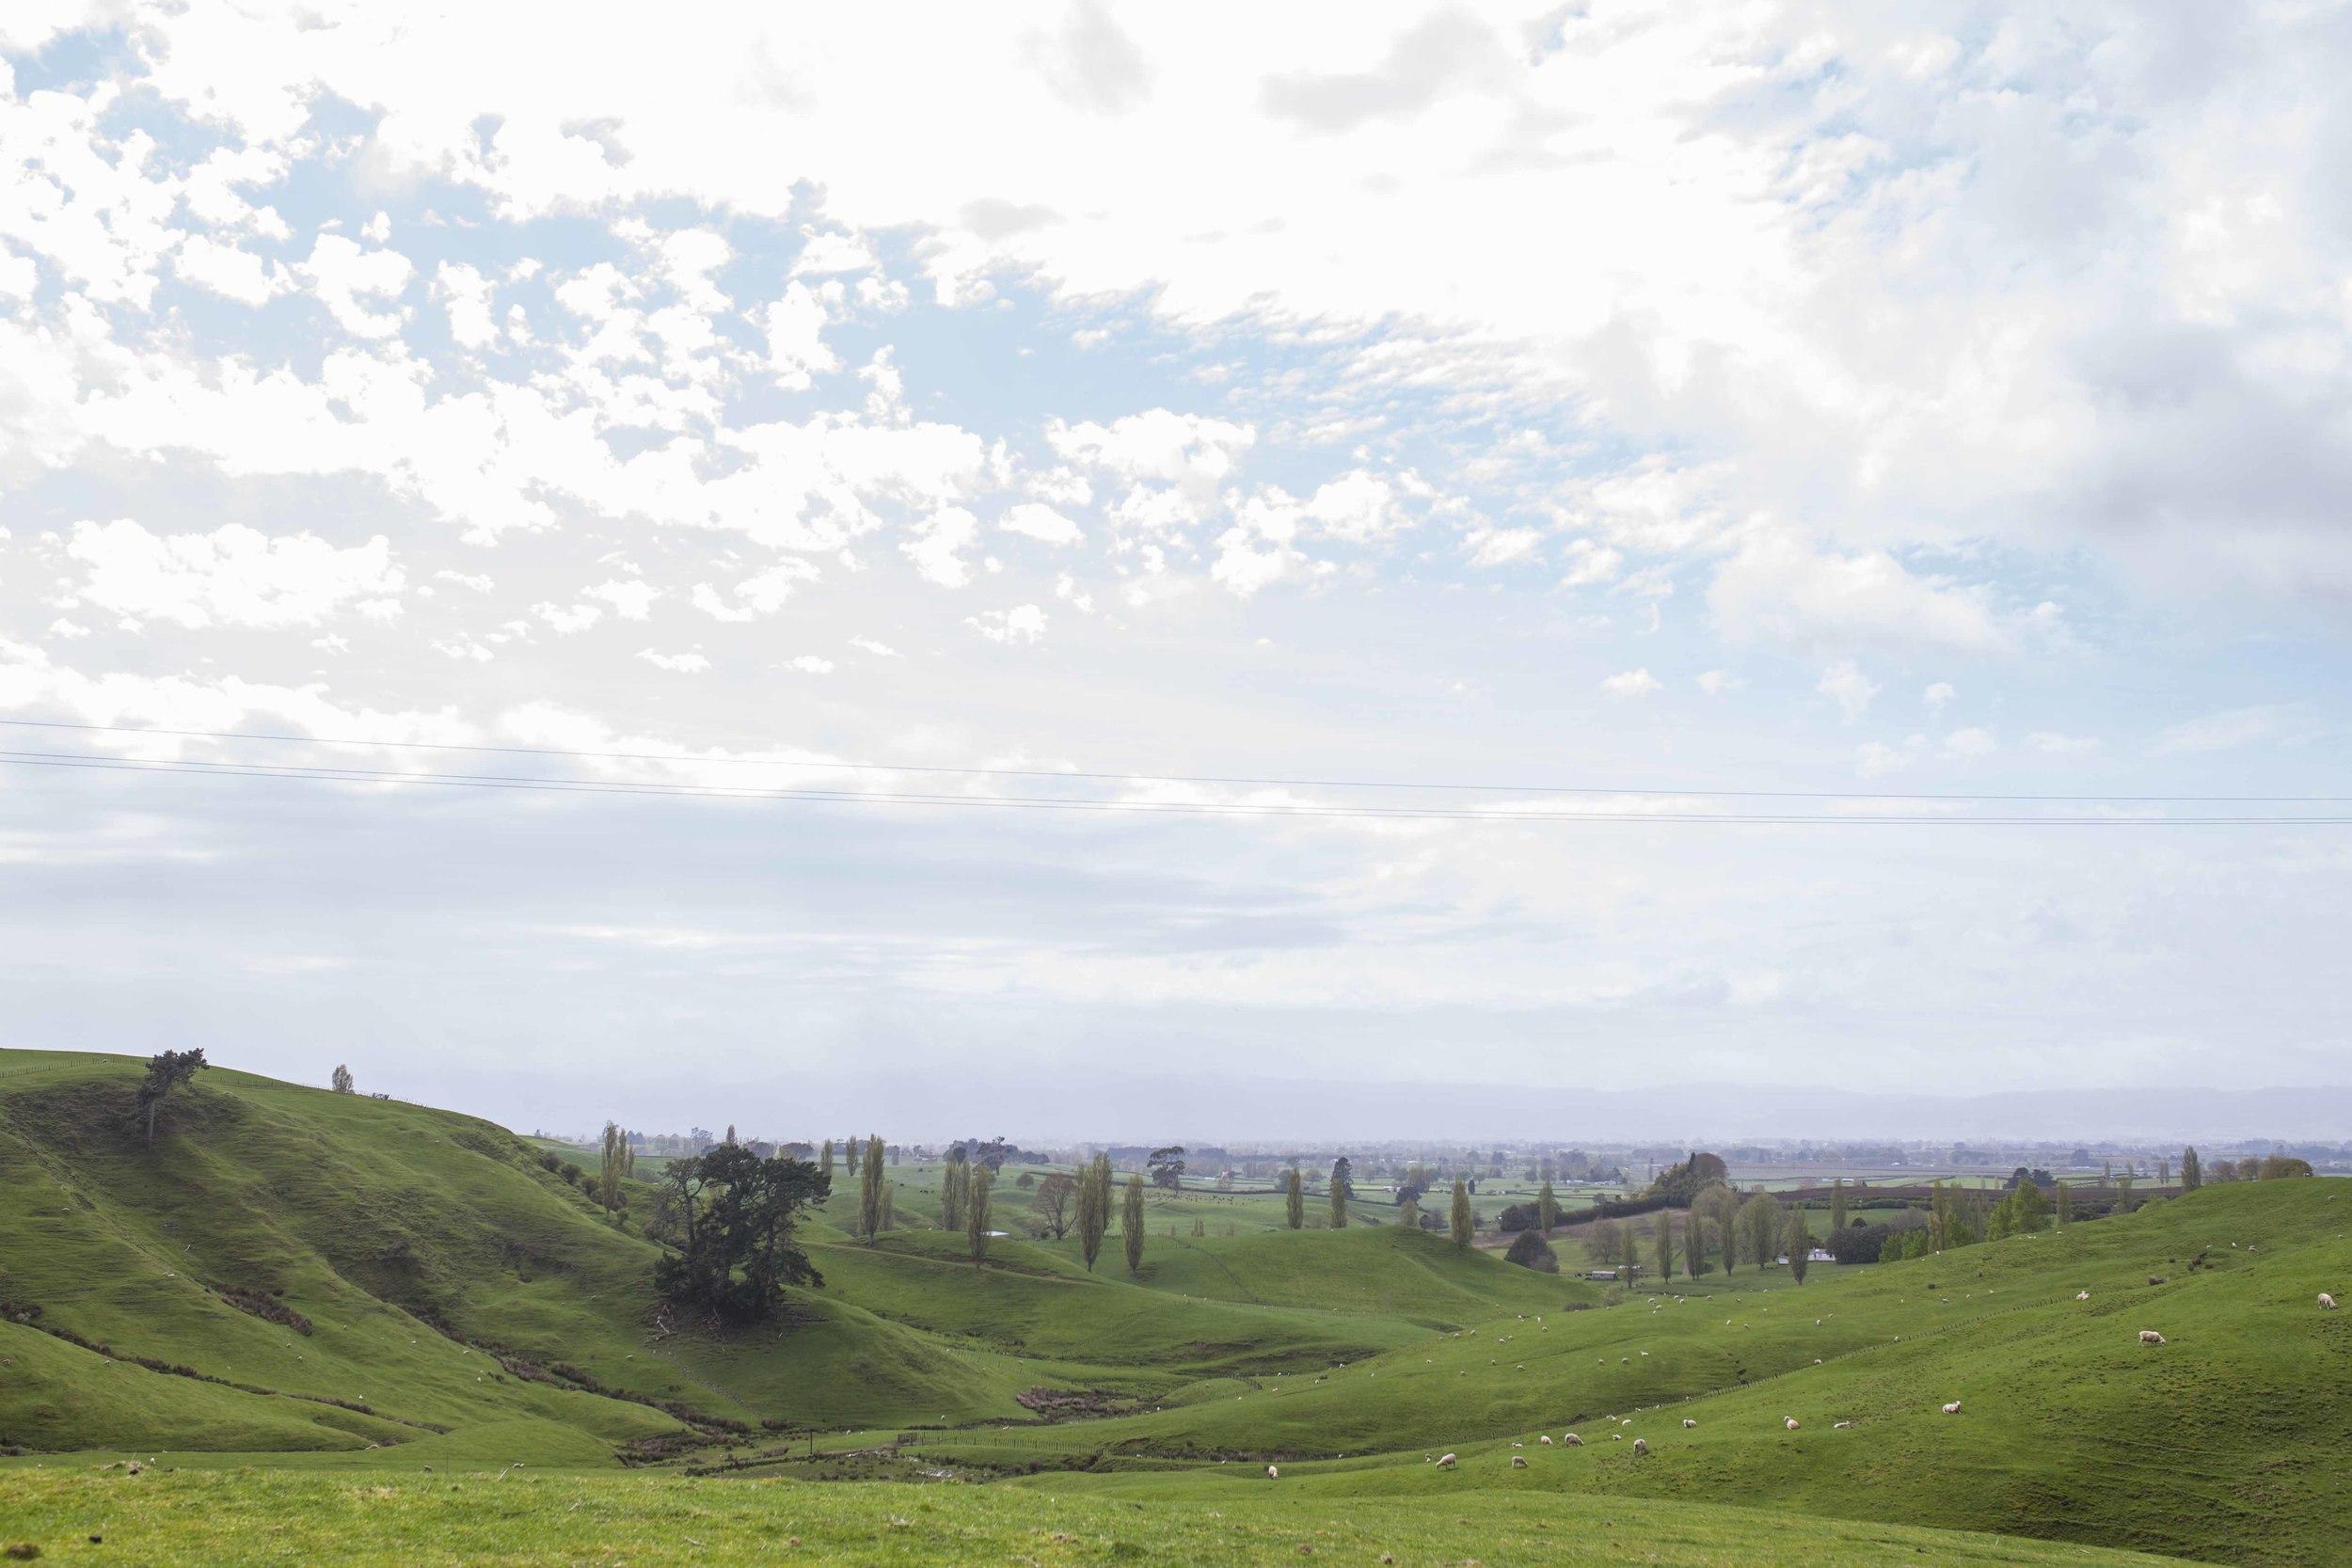 064Toronto Lifestyle Photographers -Hobbiton, New Zealand - Jono & Laynie Co.jpg